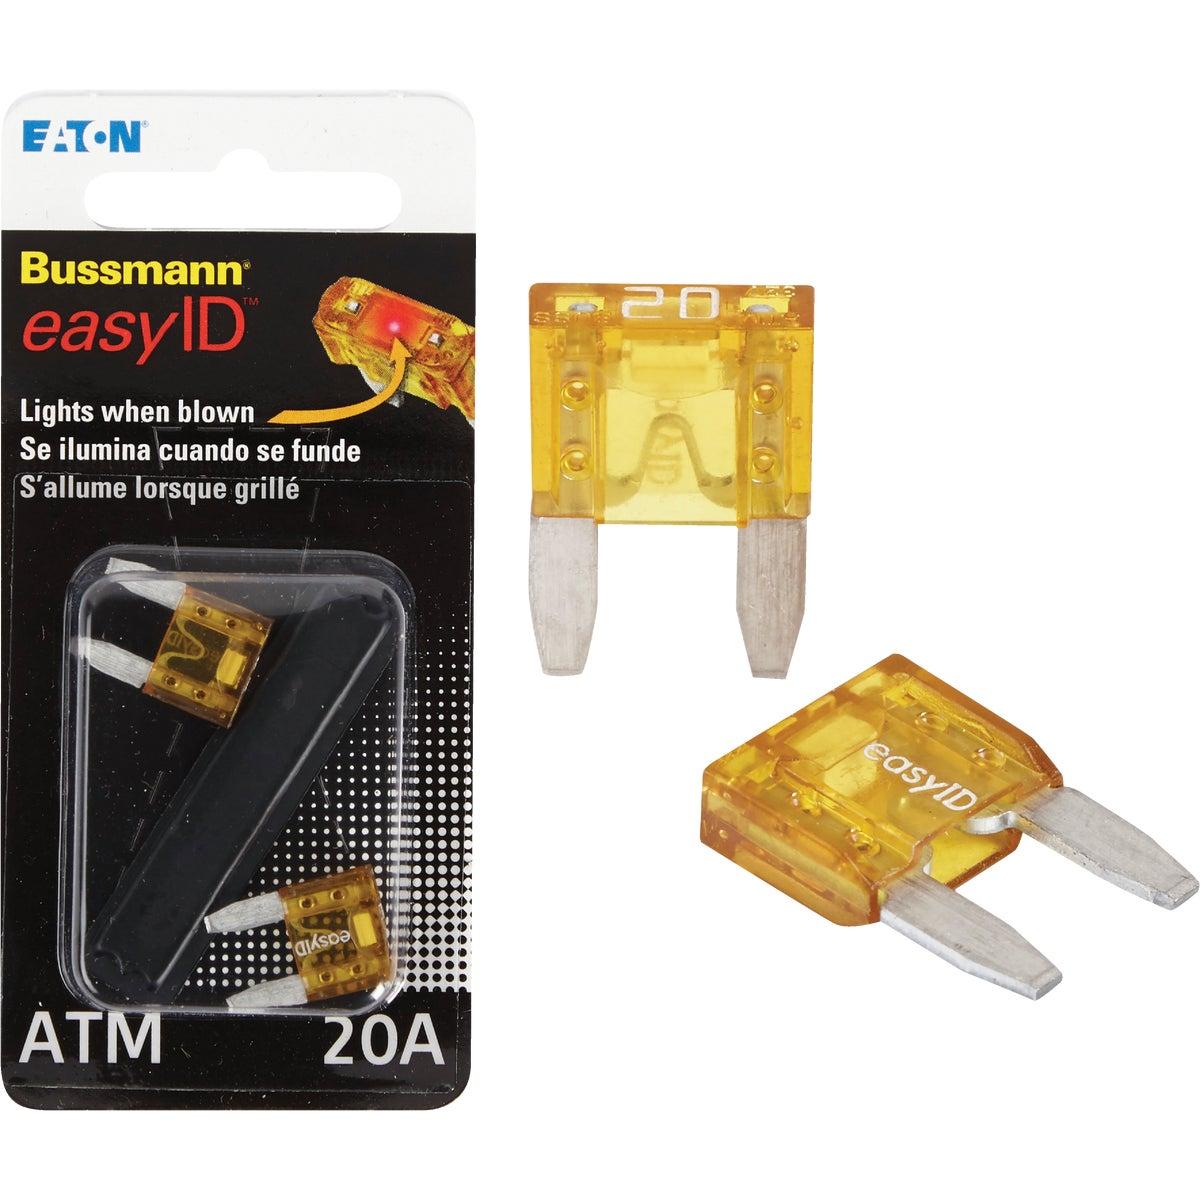 2PK 20A ATM EASY ID FUSE - BP/ATM-20ID by Bussmann Cooper